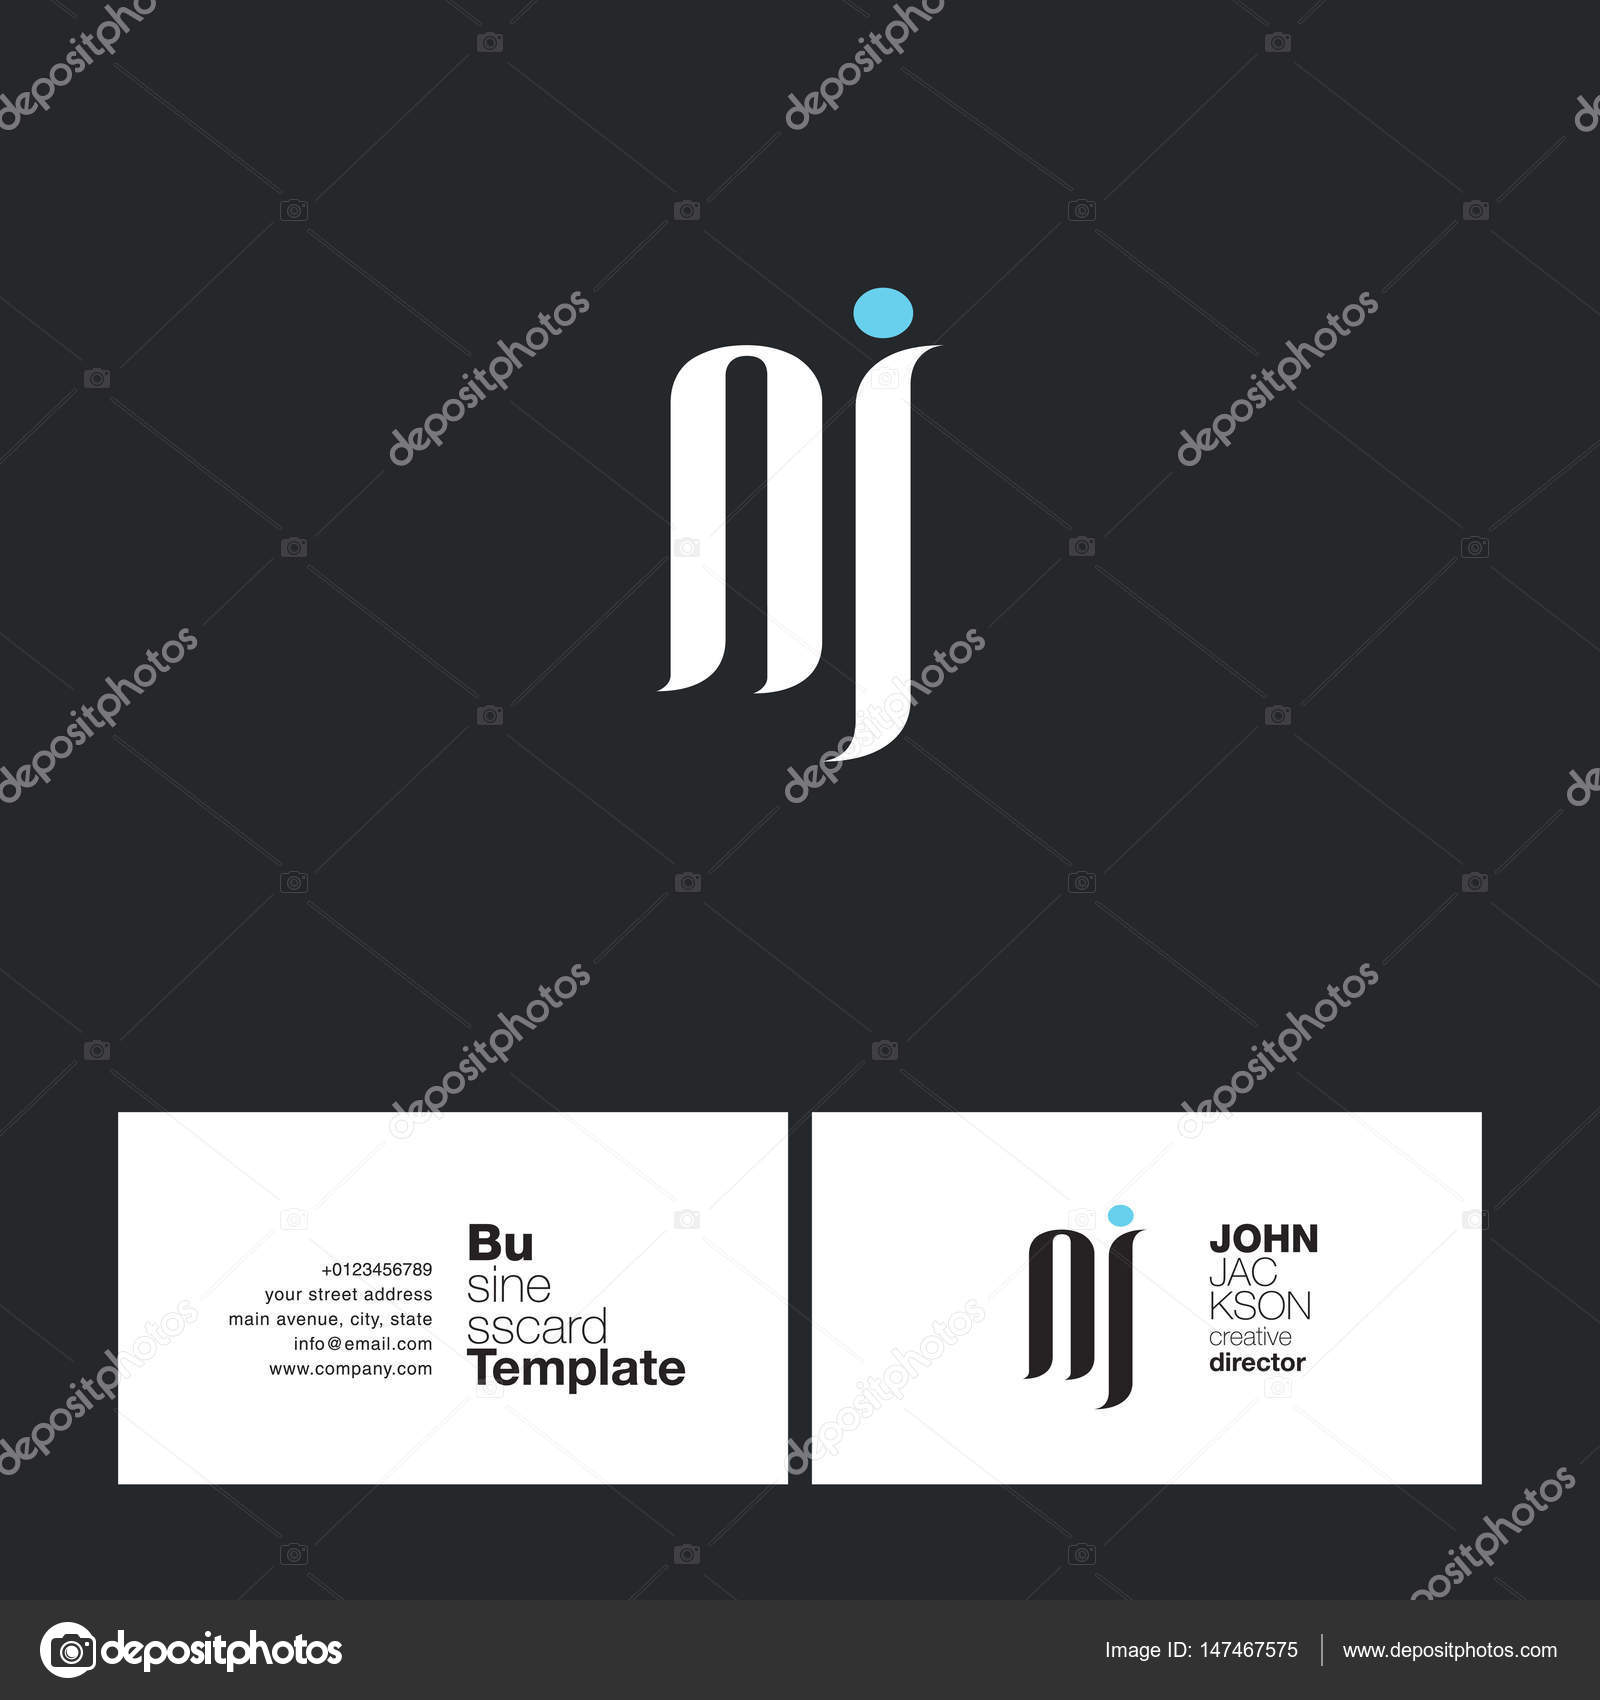 NJ Letters Logo Business Card — Stock Vector © brainbistro #147467575